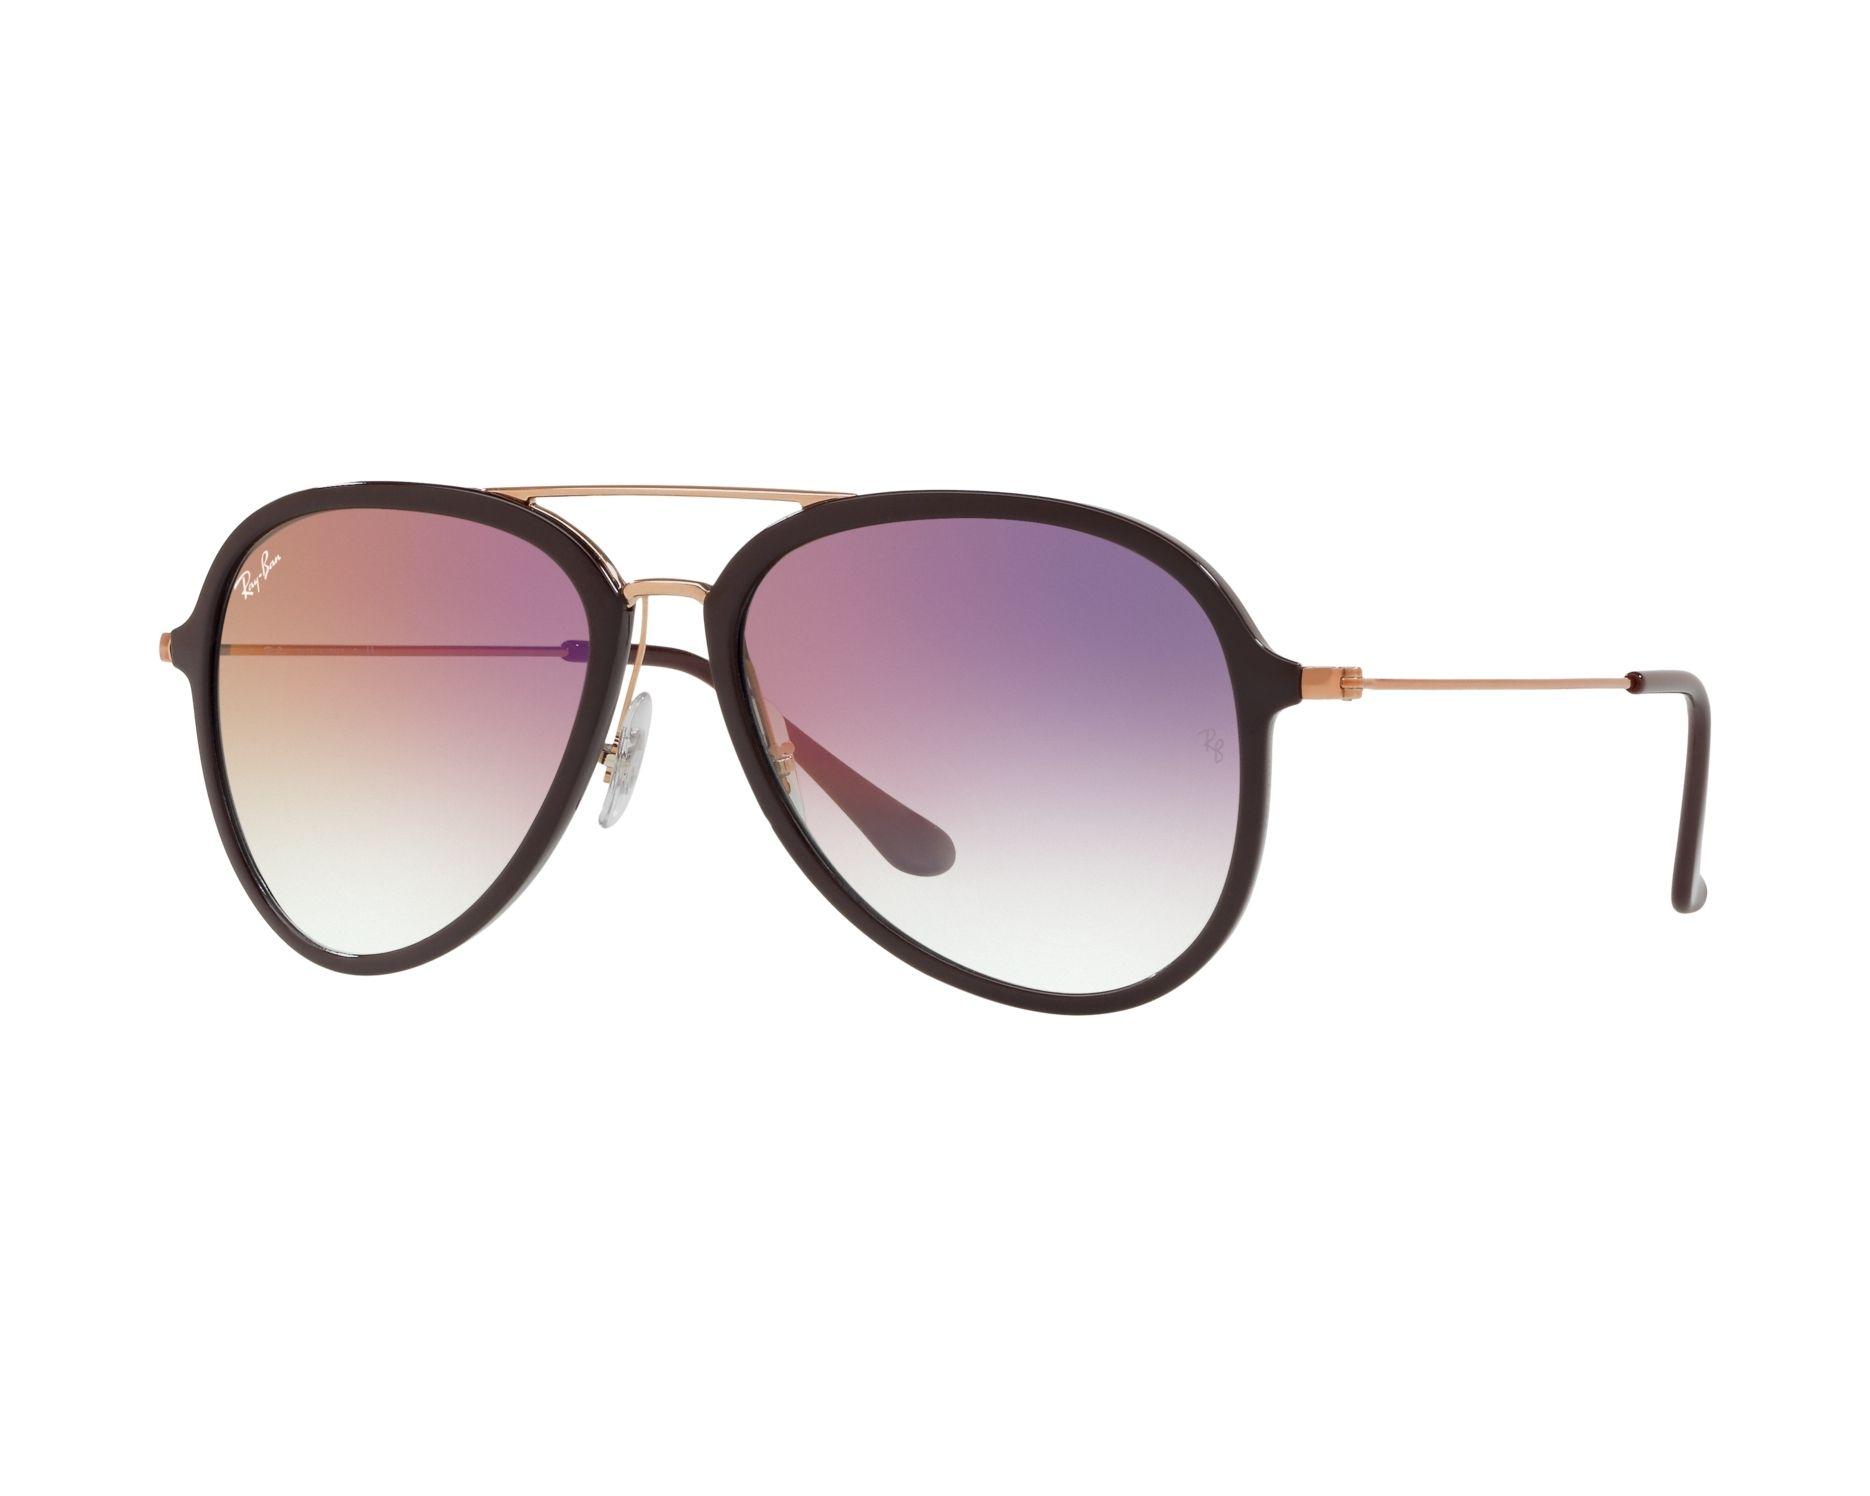 1fbbdd90767 Sunglasses Ray-Ban RB-4298 6335S5 57-17 Bordeaux Gold